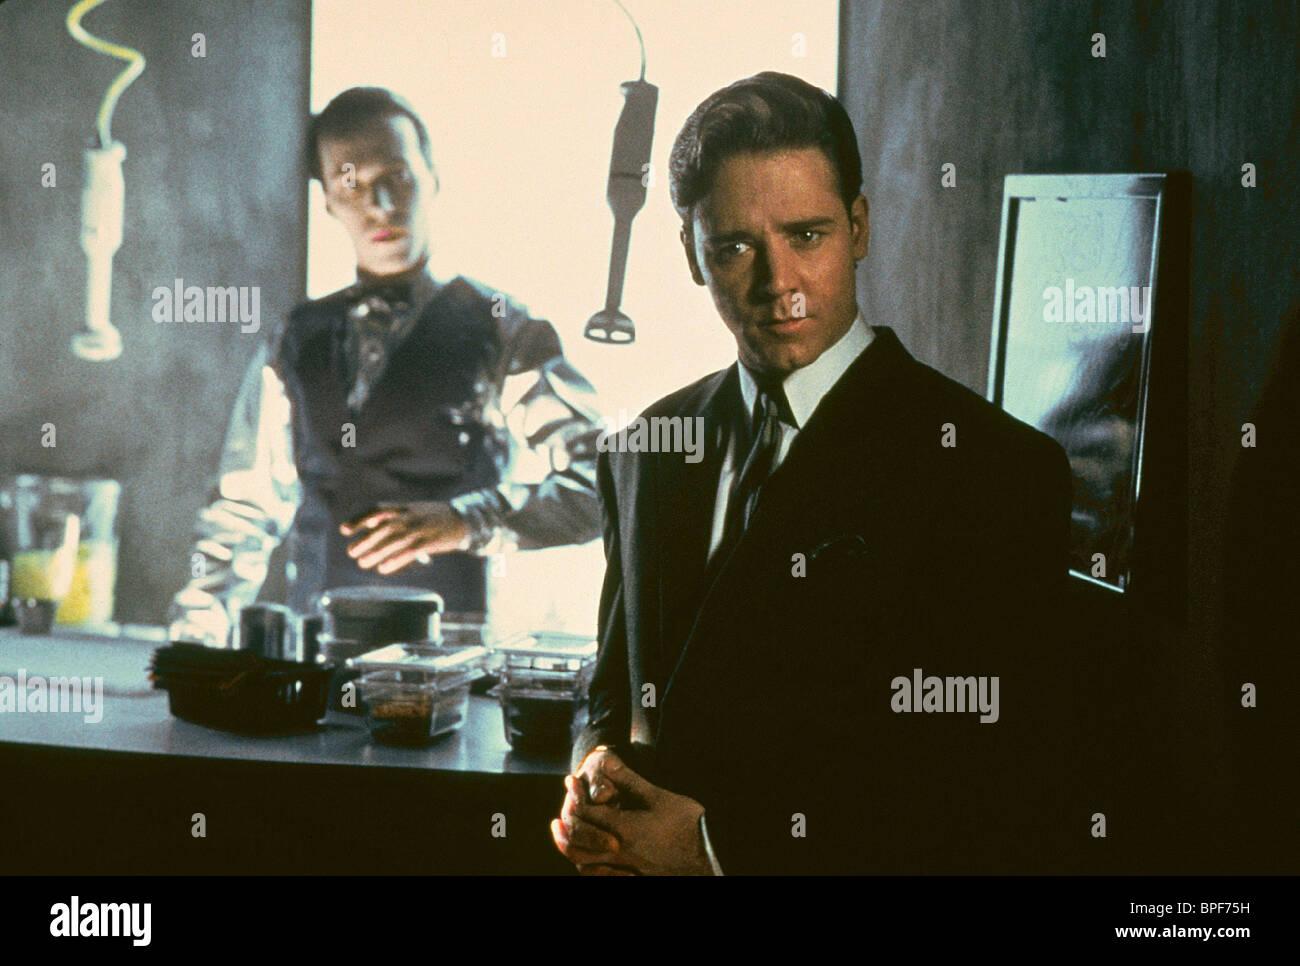 RUSSELL CROWE VIRTUOSITY (1995) - Stock Image